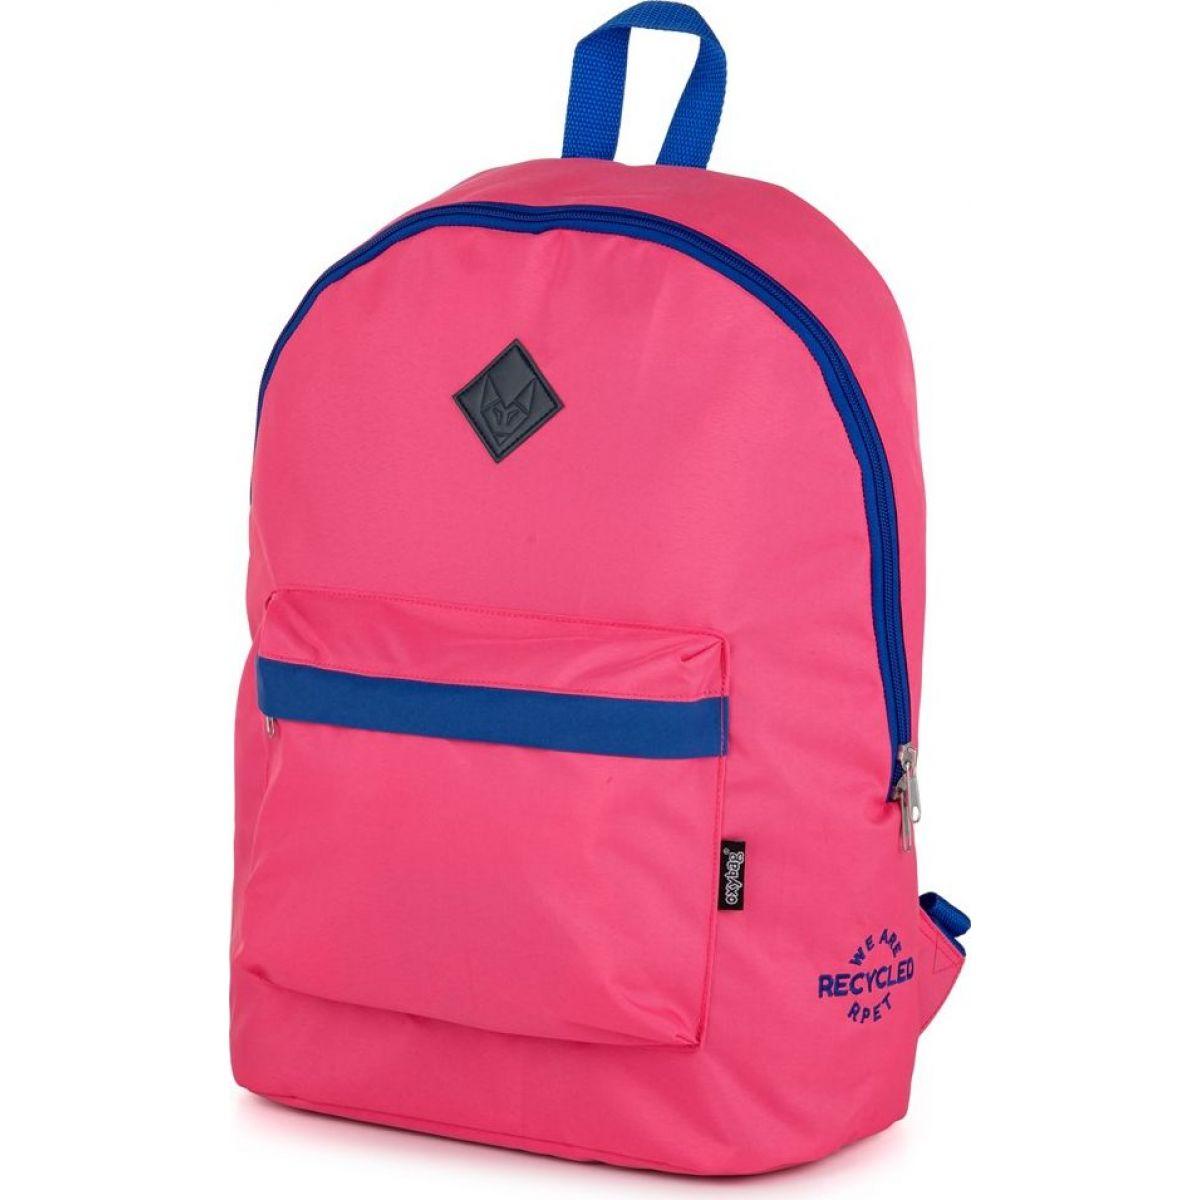 Karton P + P Študentský batoh Oxy Street fashion pink